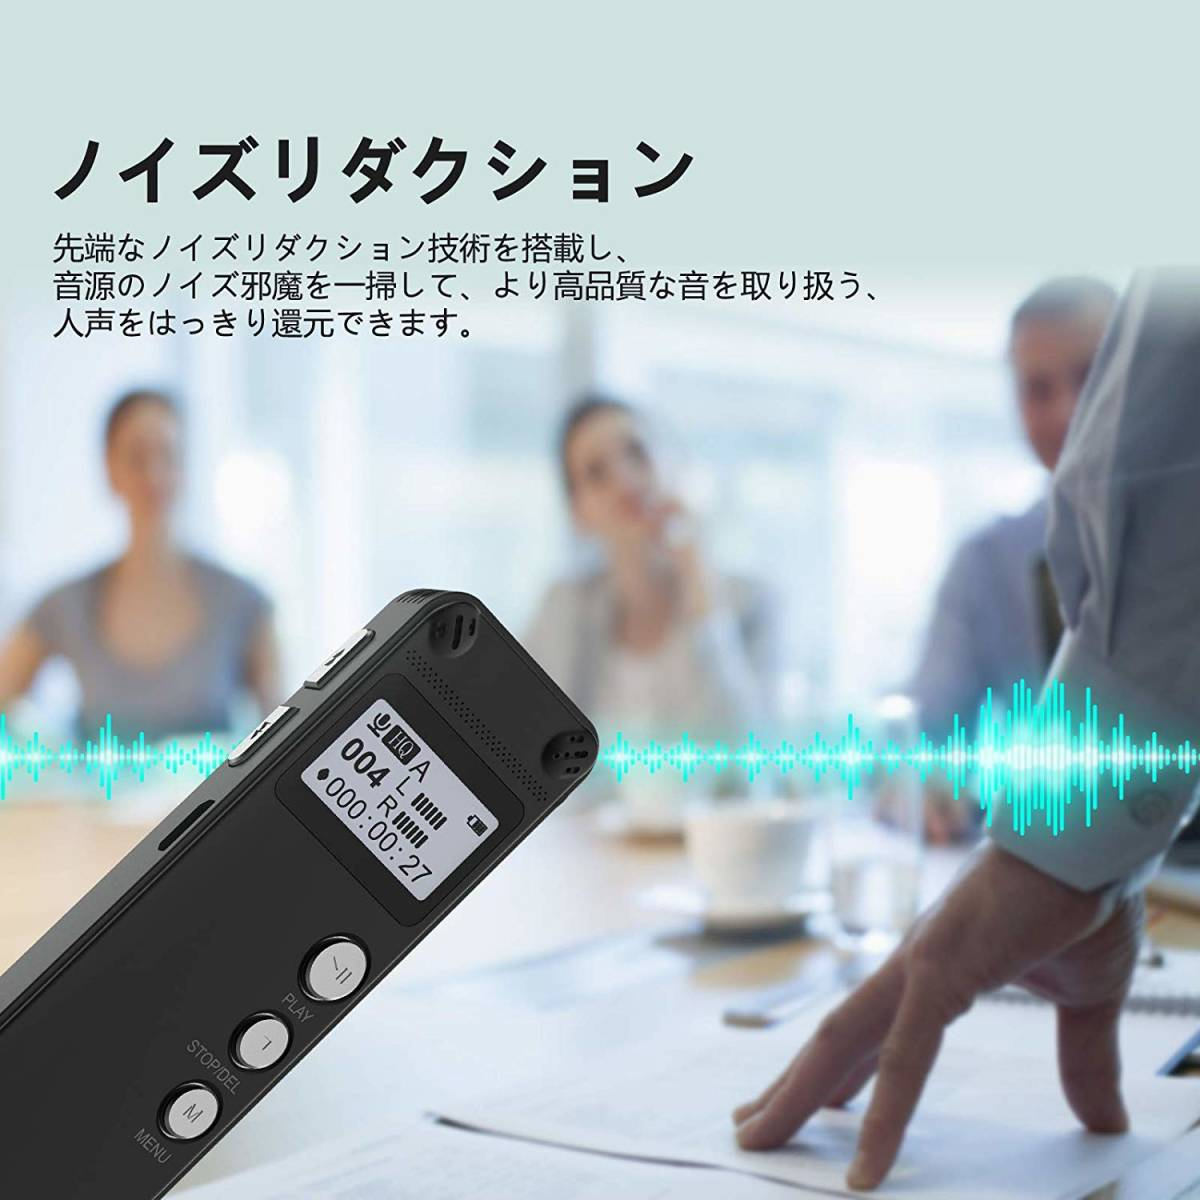 O991 新品 ボイスレコーダー ICレコーダー ノイズリダクション録音機 小型軽量MP3 高音質 大容量長時間録音 音声検出 定時録音_画像5